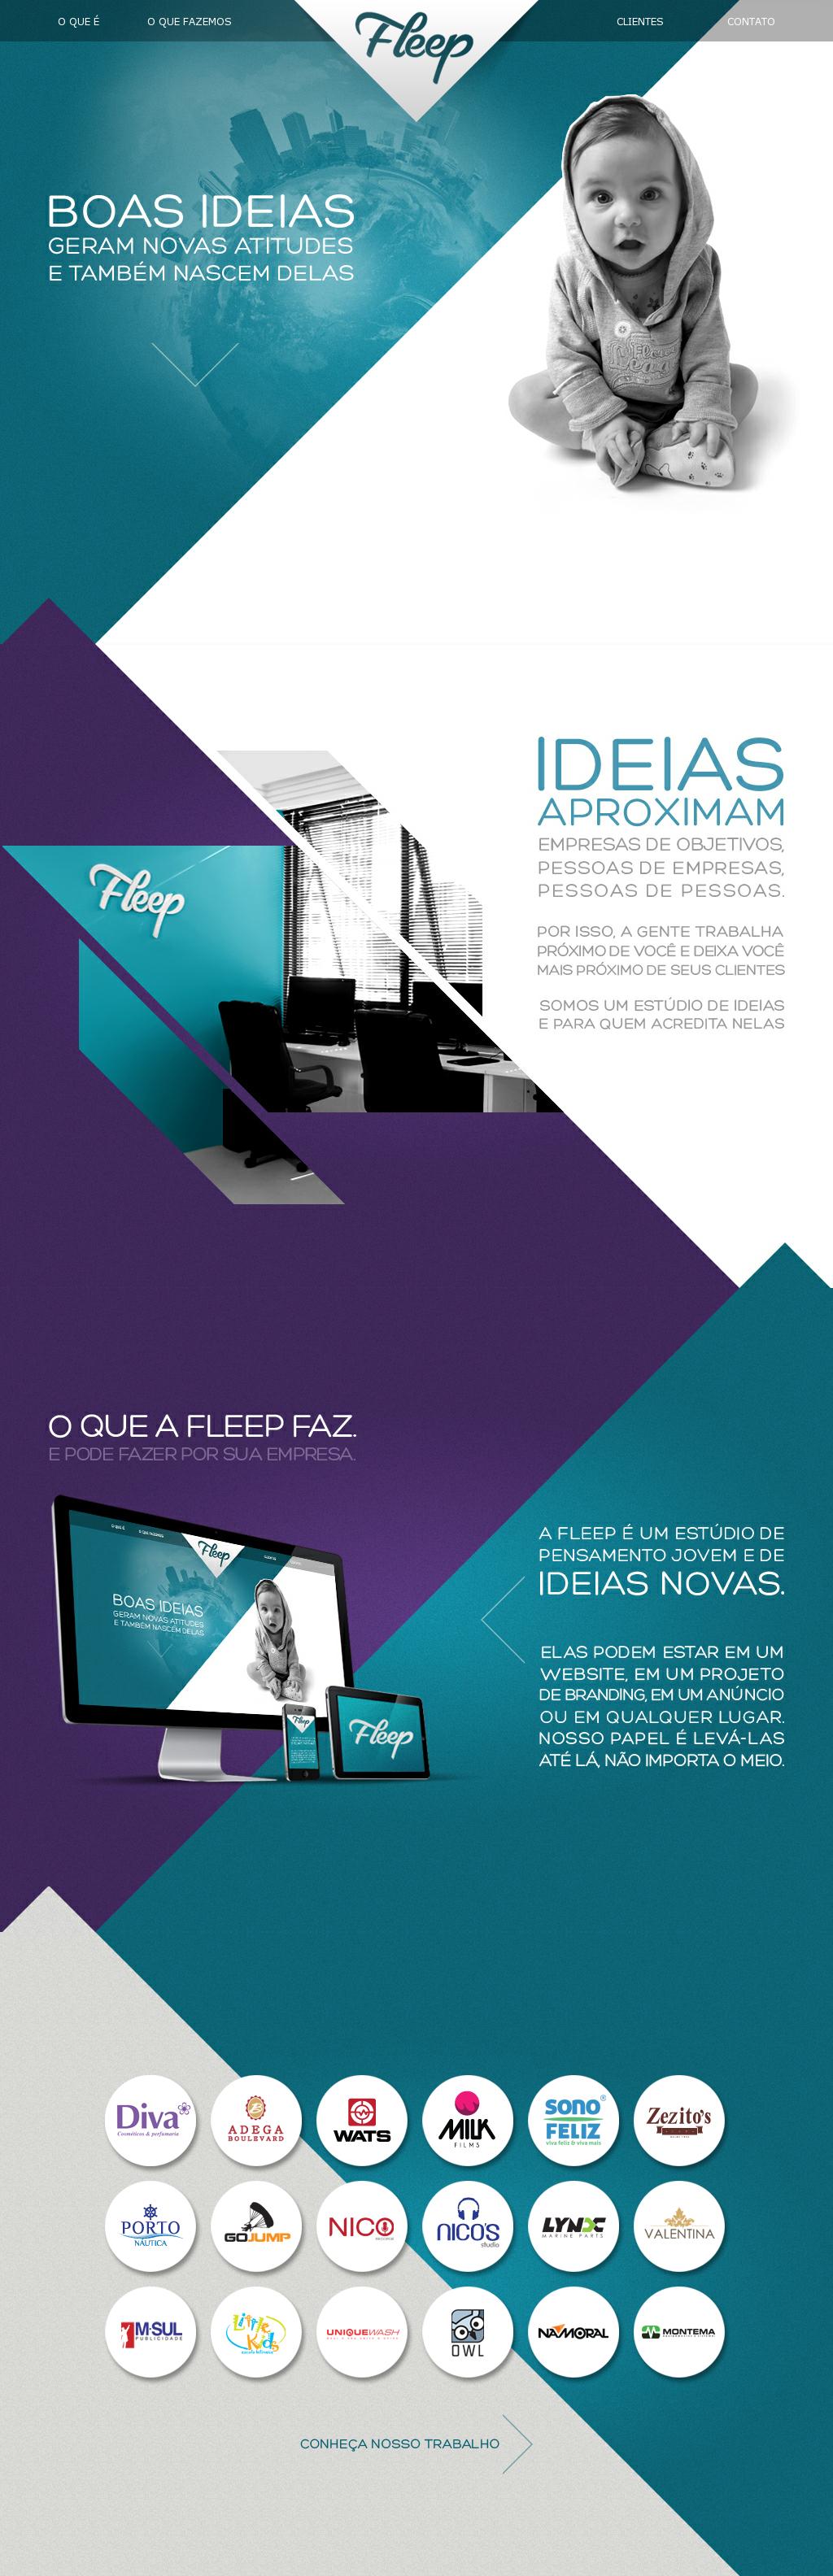 New Single Page Website Http Www Fleep Art Br Web Design Inspiracao Web Design Designs De Websites